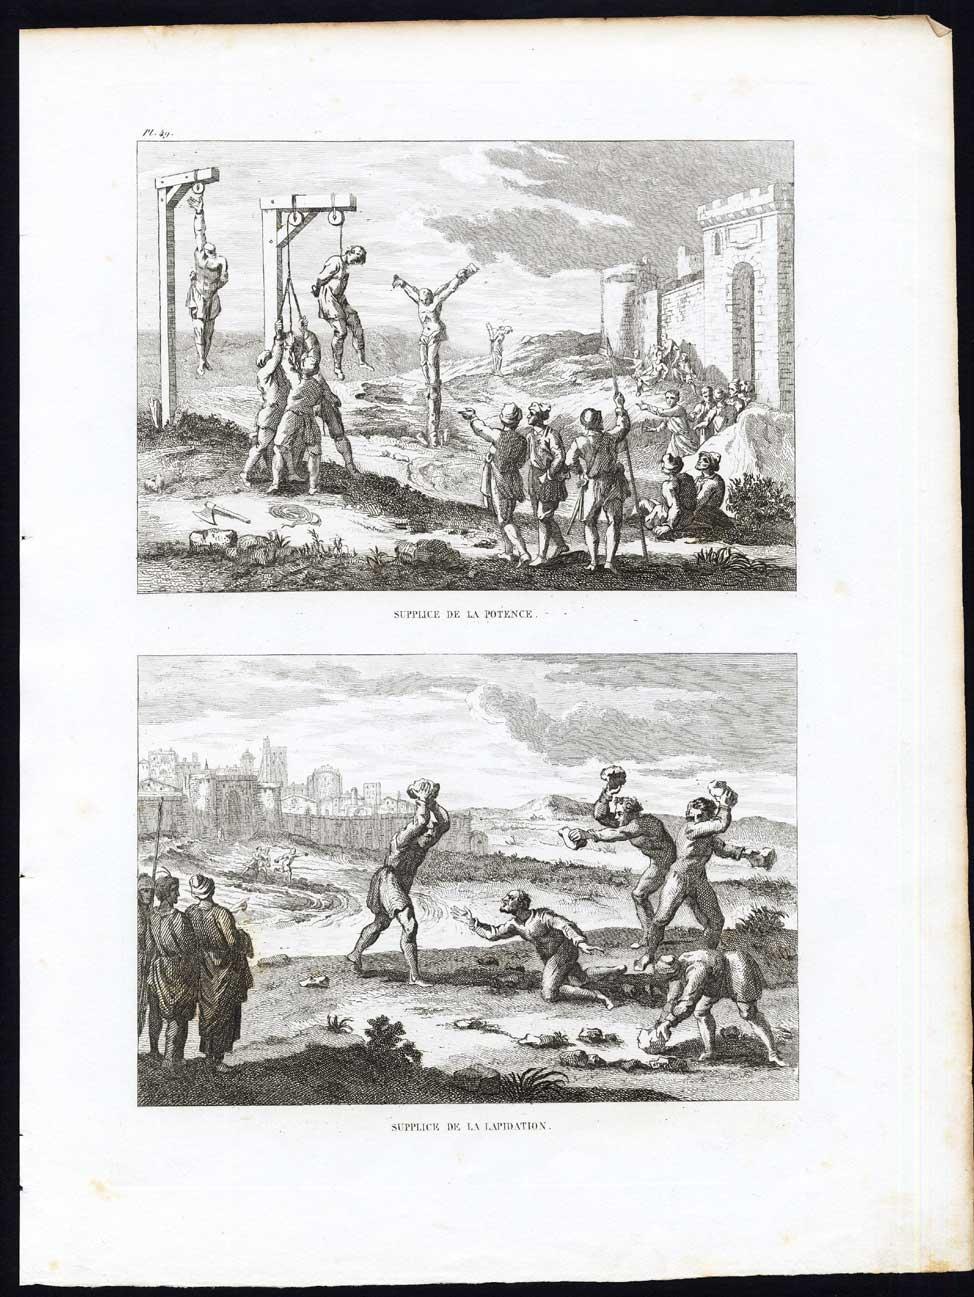 Antique Print-TORTURE-STONING-GALLOWS-CRUSHING-PUNISHMENT